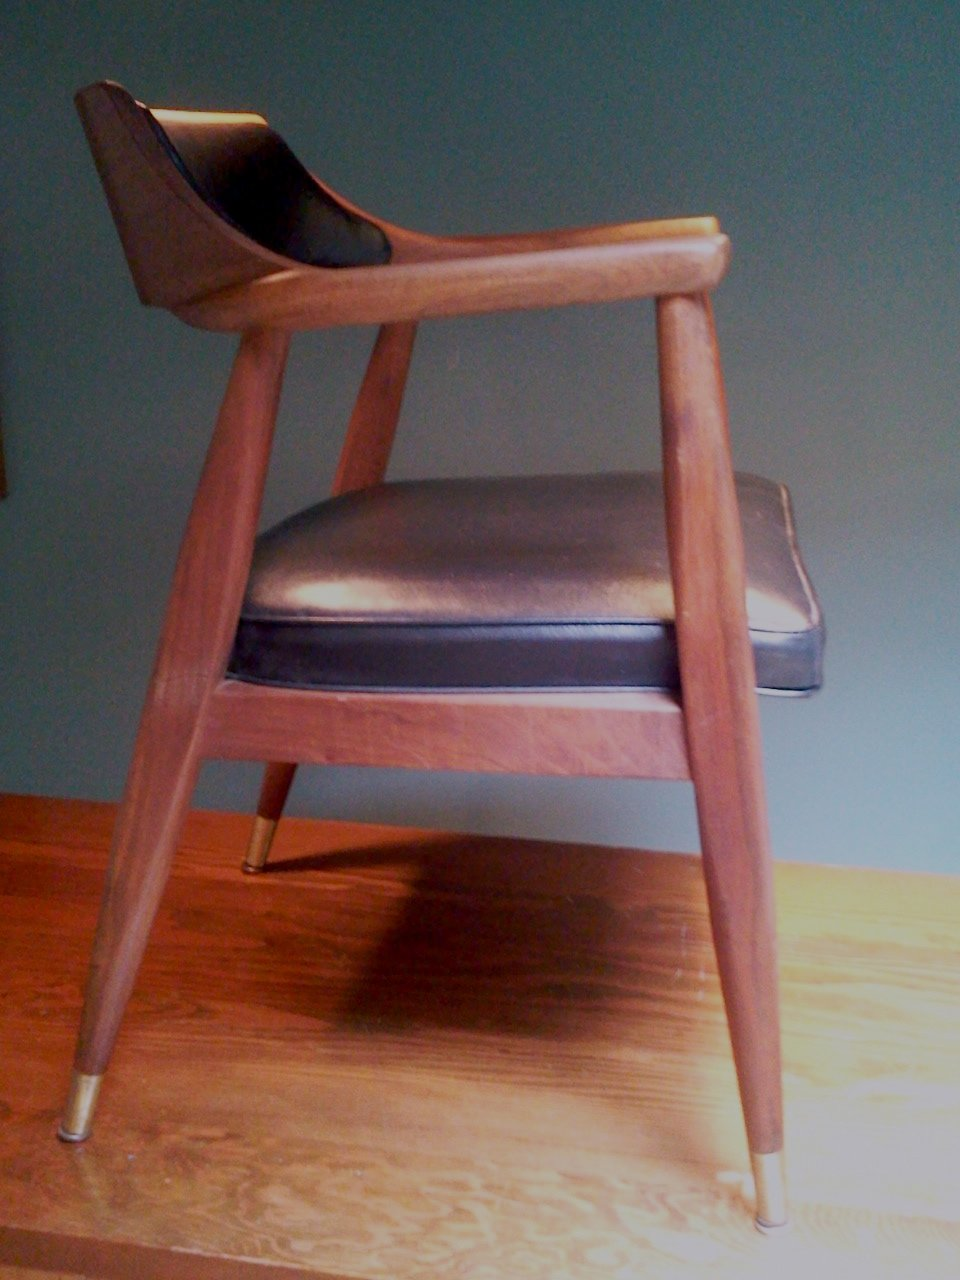 https://epochfurnishings.com/wp-content/uploads/2015/05/mid-century-modern-walnut-office-chair-Jun-2-2015-12-27-PM.55.jpg